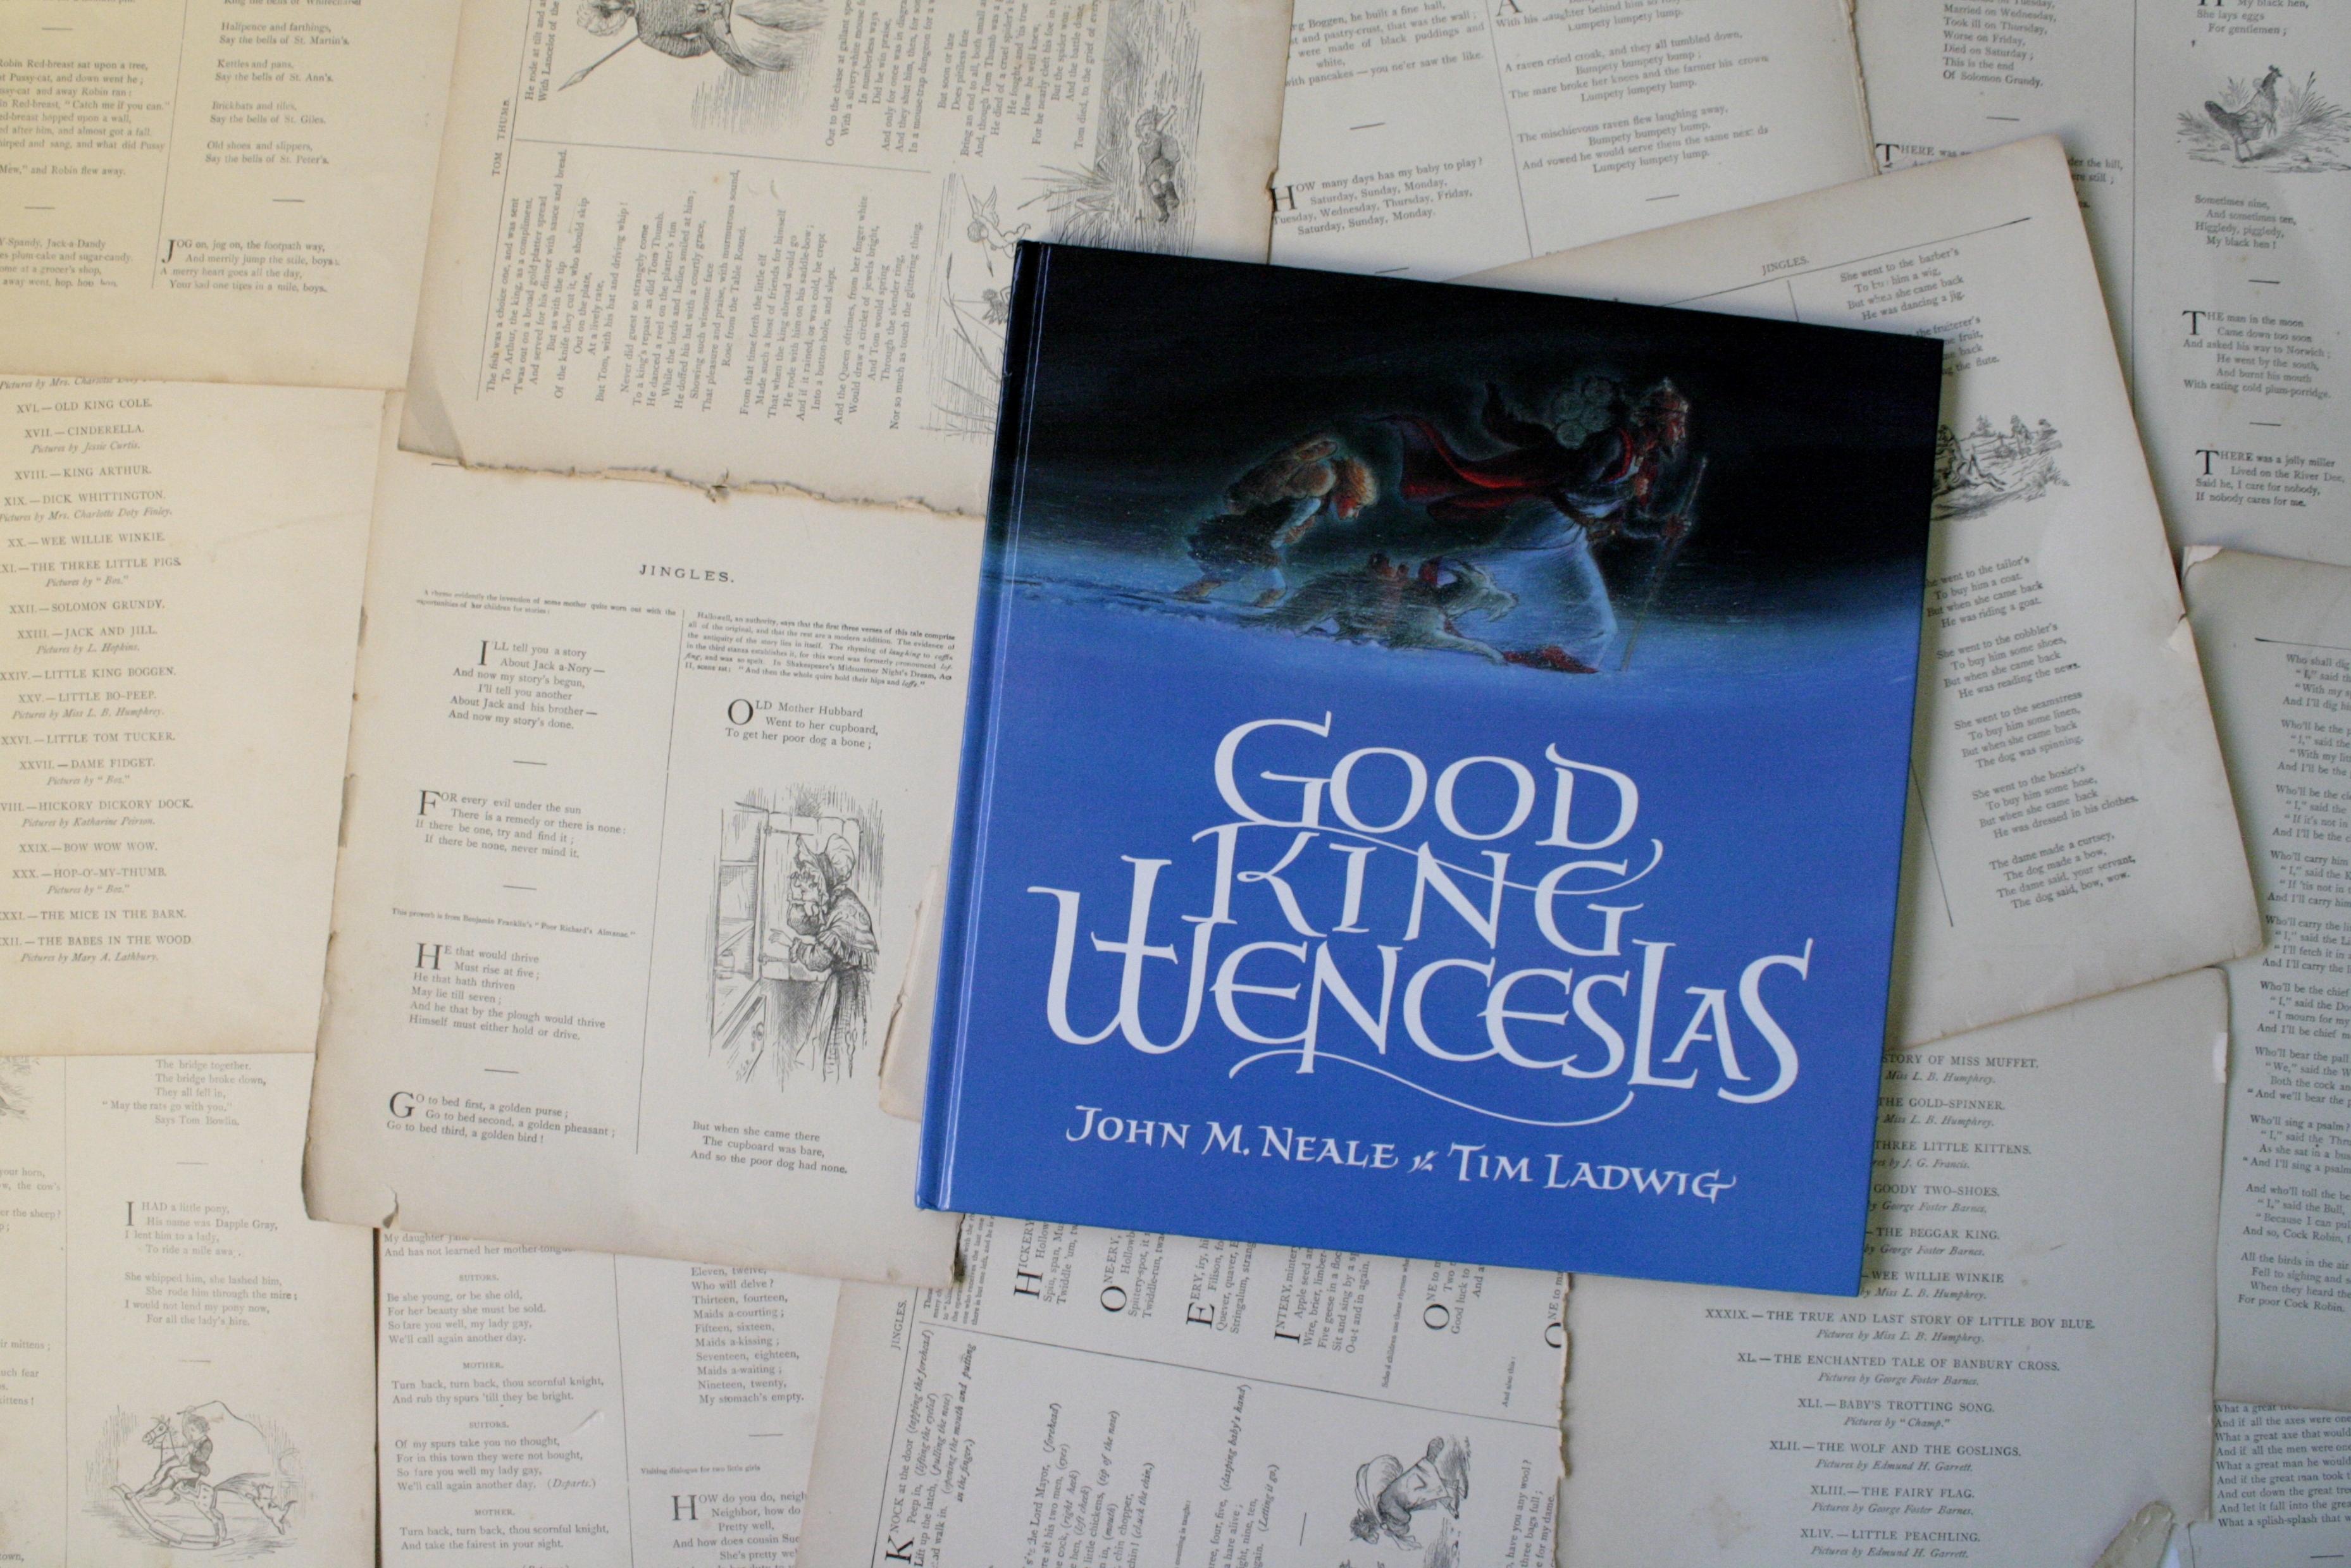 Good King Wenceslas | John M. Neale